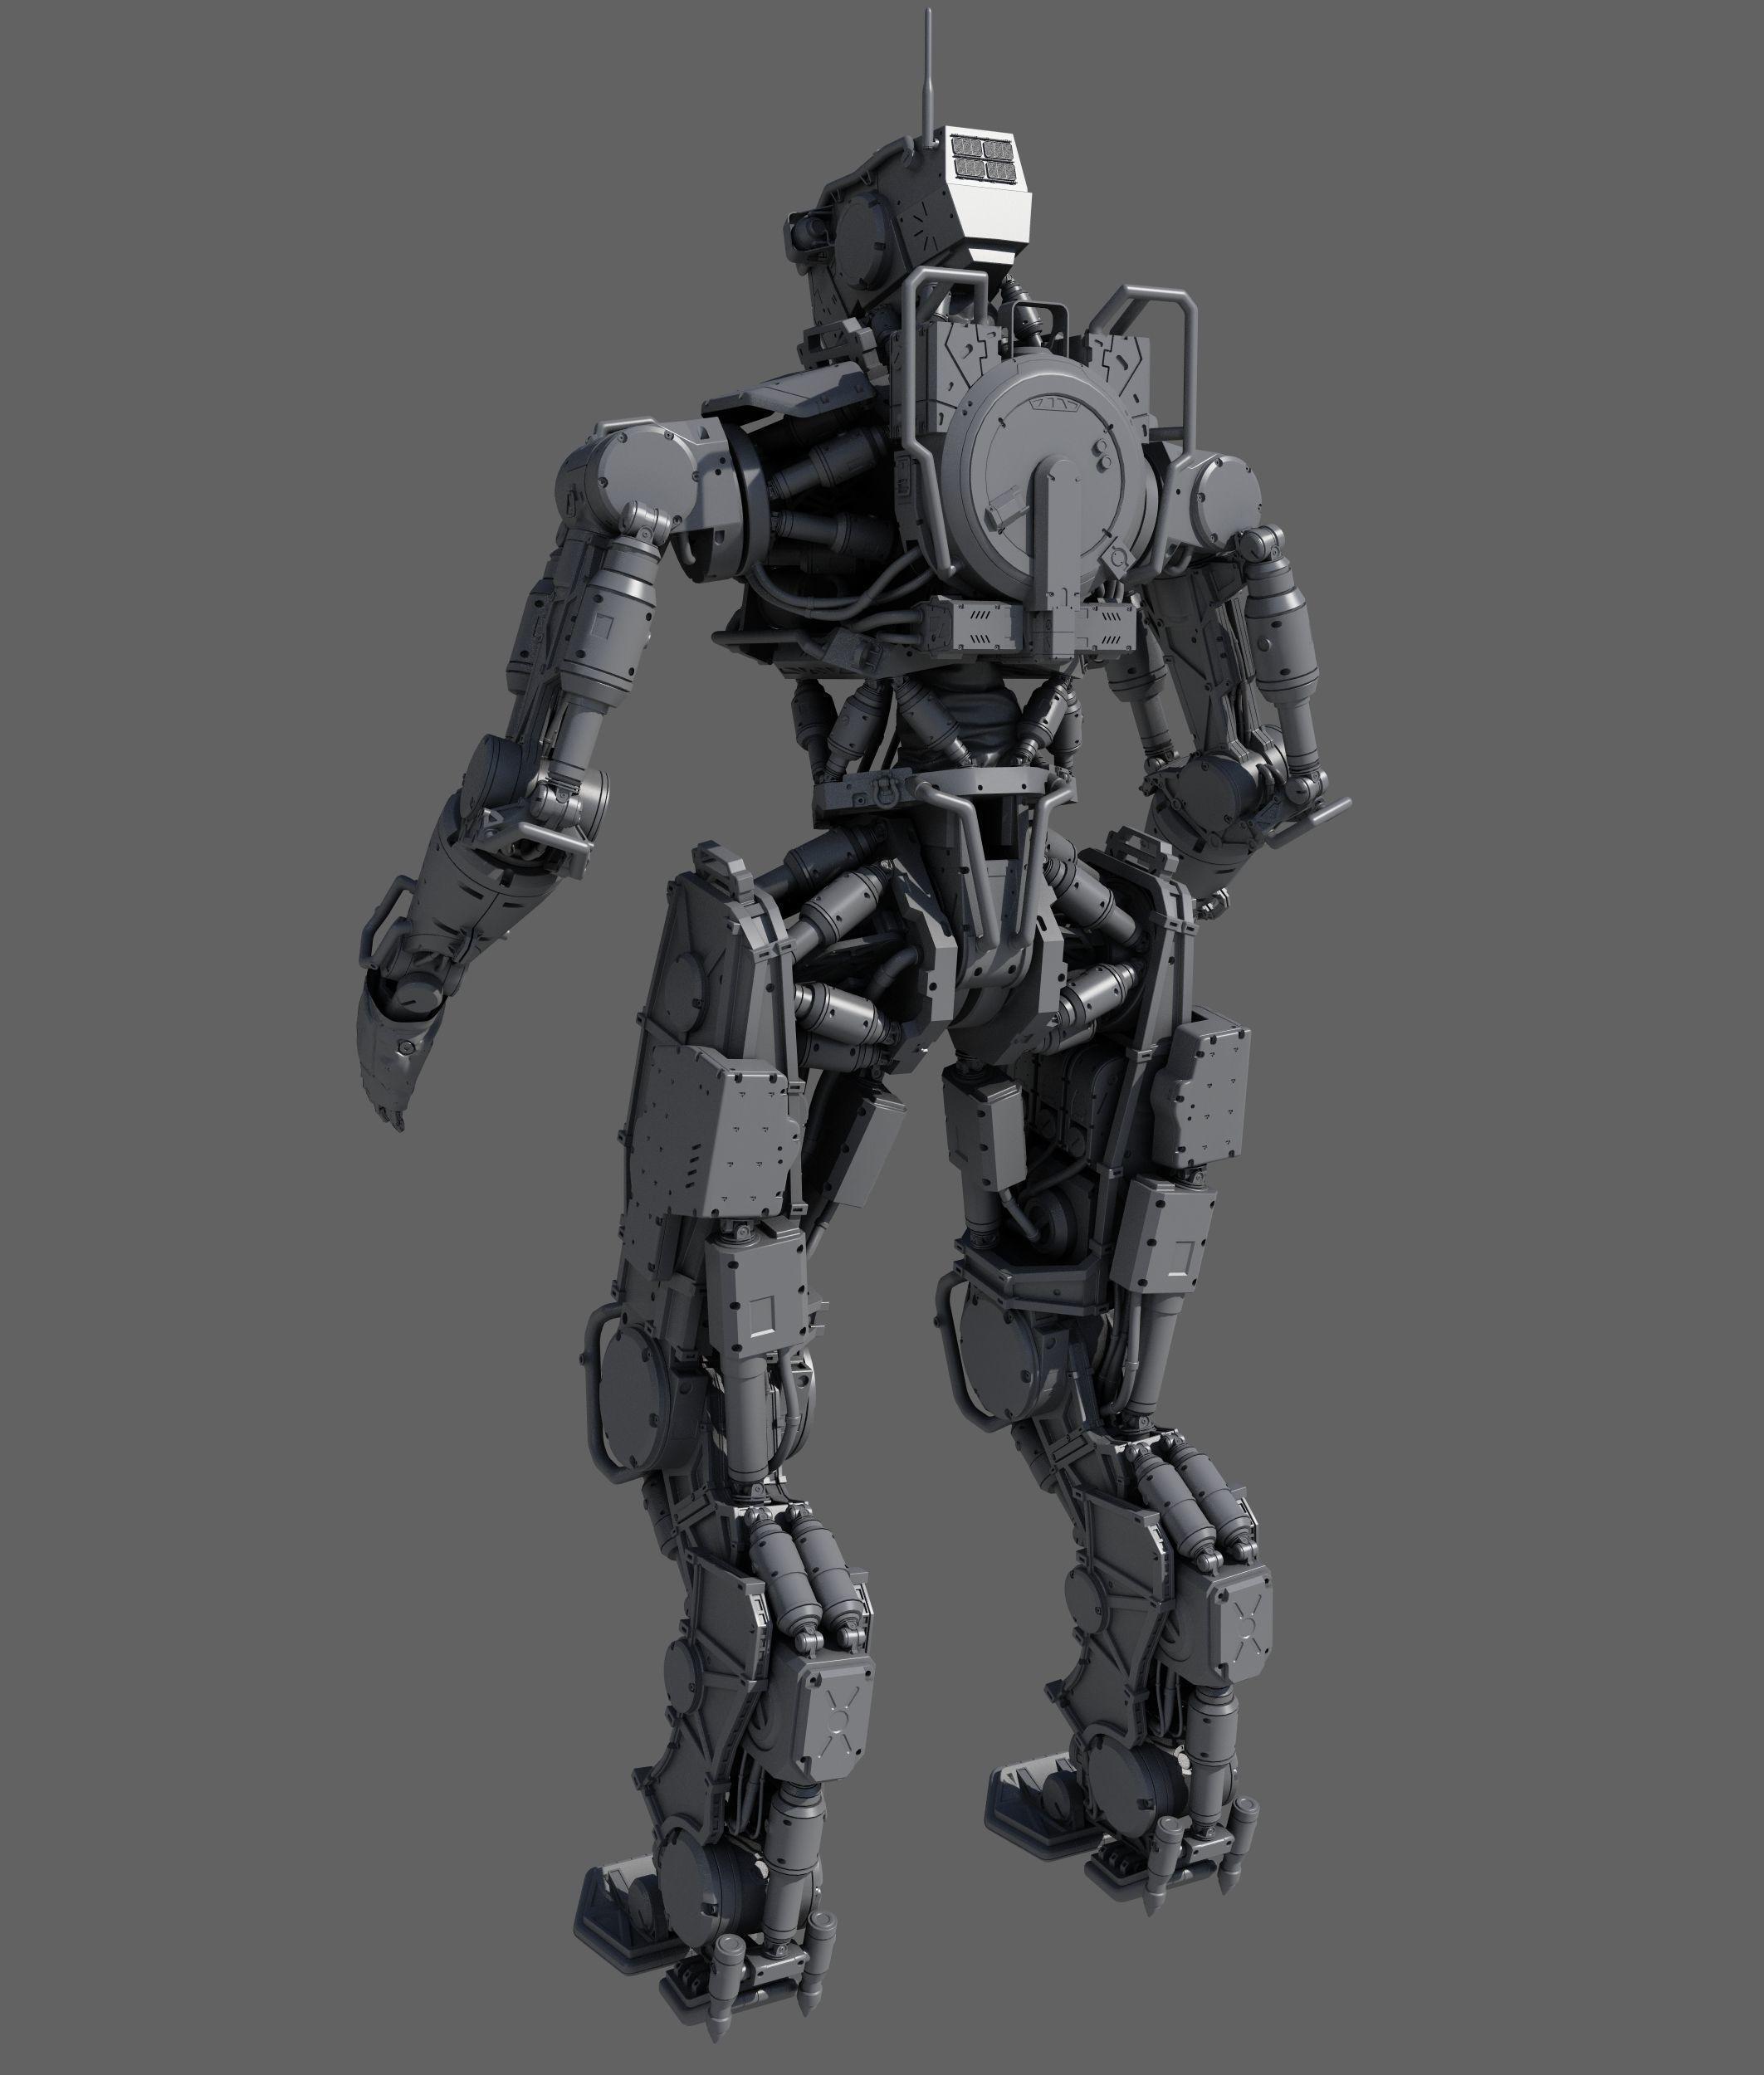 r soldier 3d model max obj fbx 4 | Robots and Prosthetics in